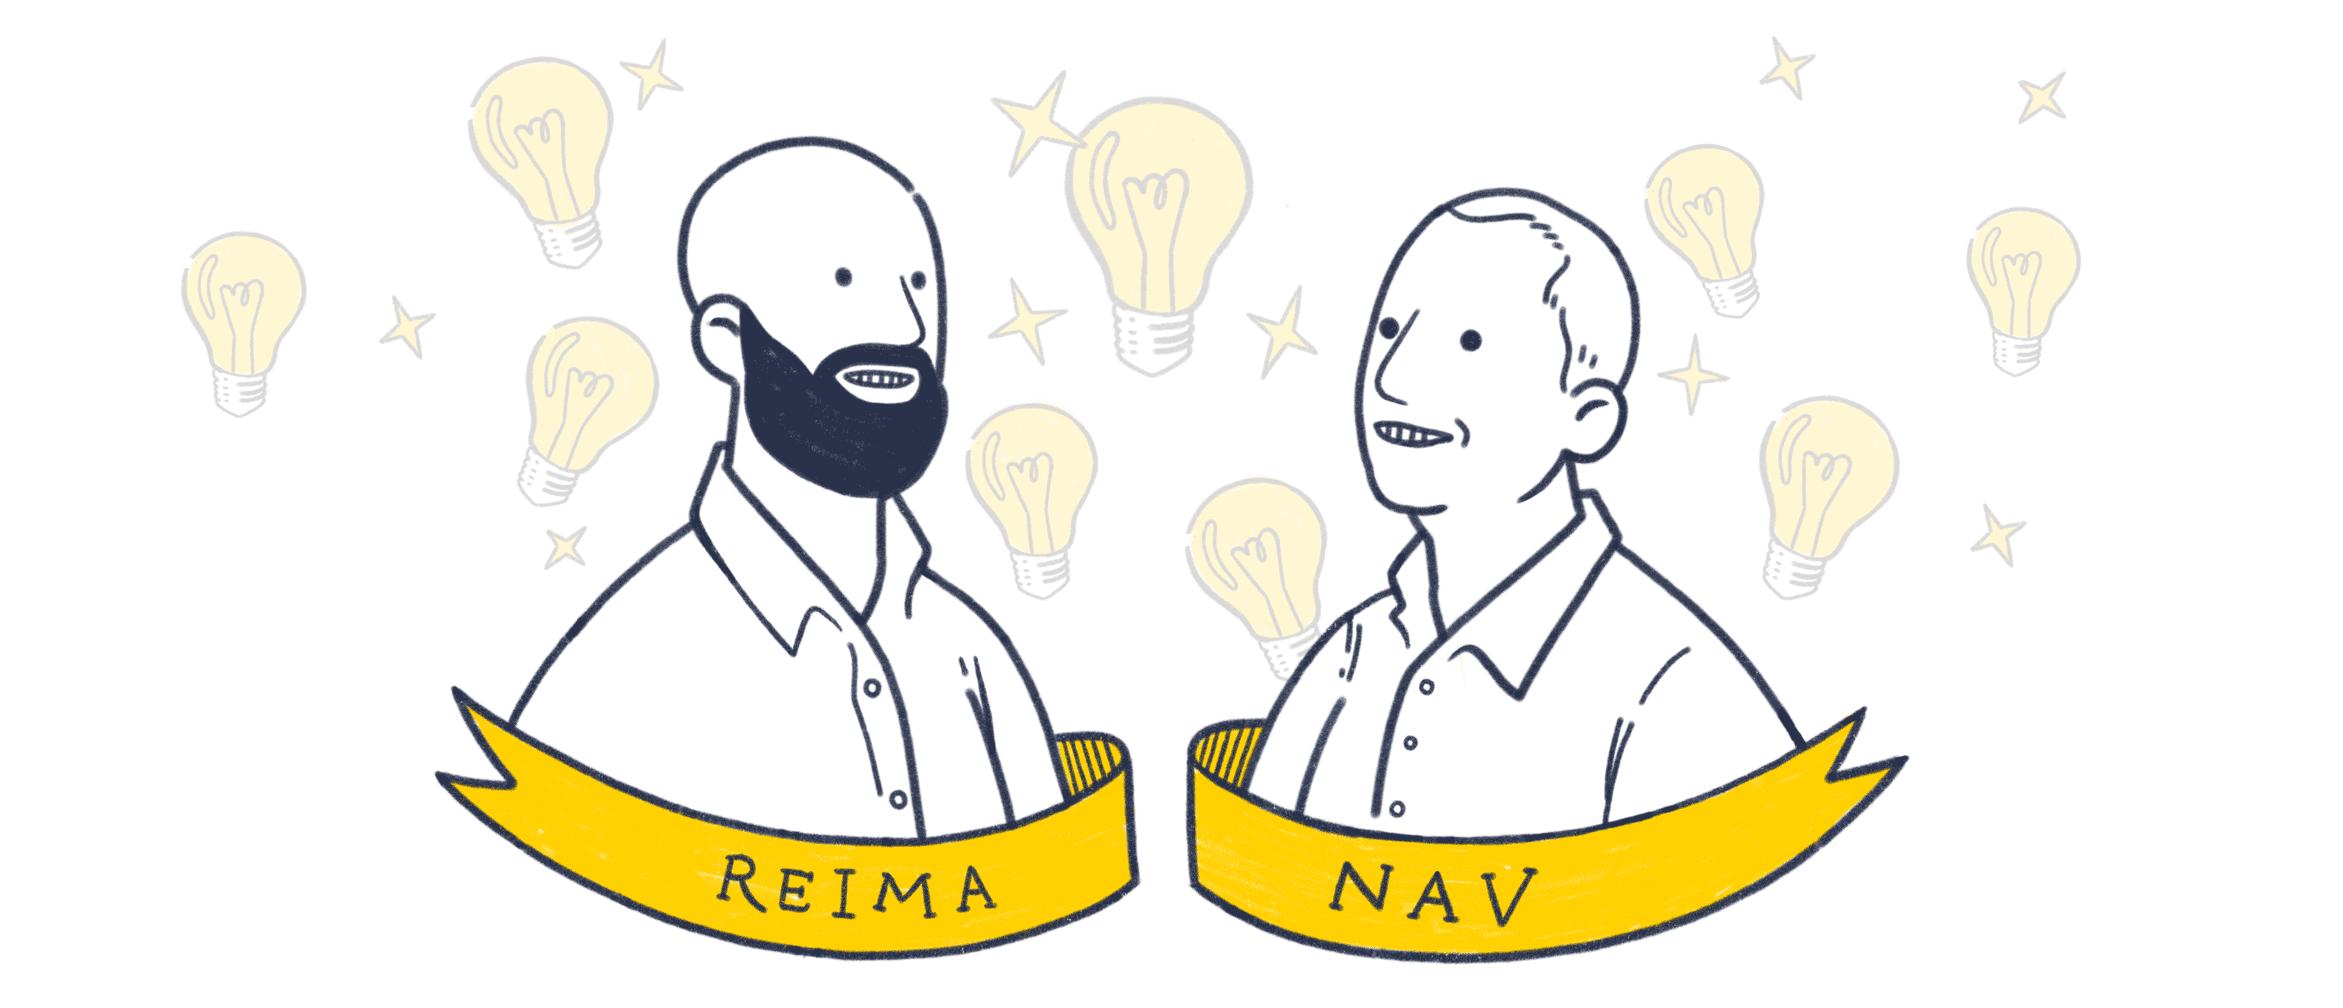 About_Nav&Reima.jpg